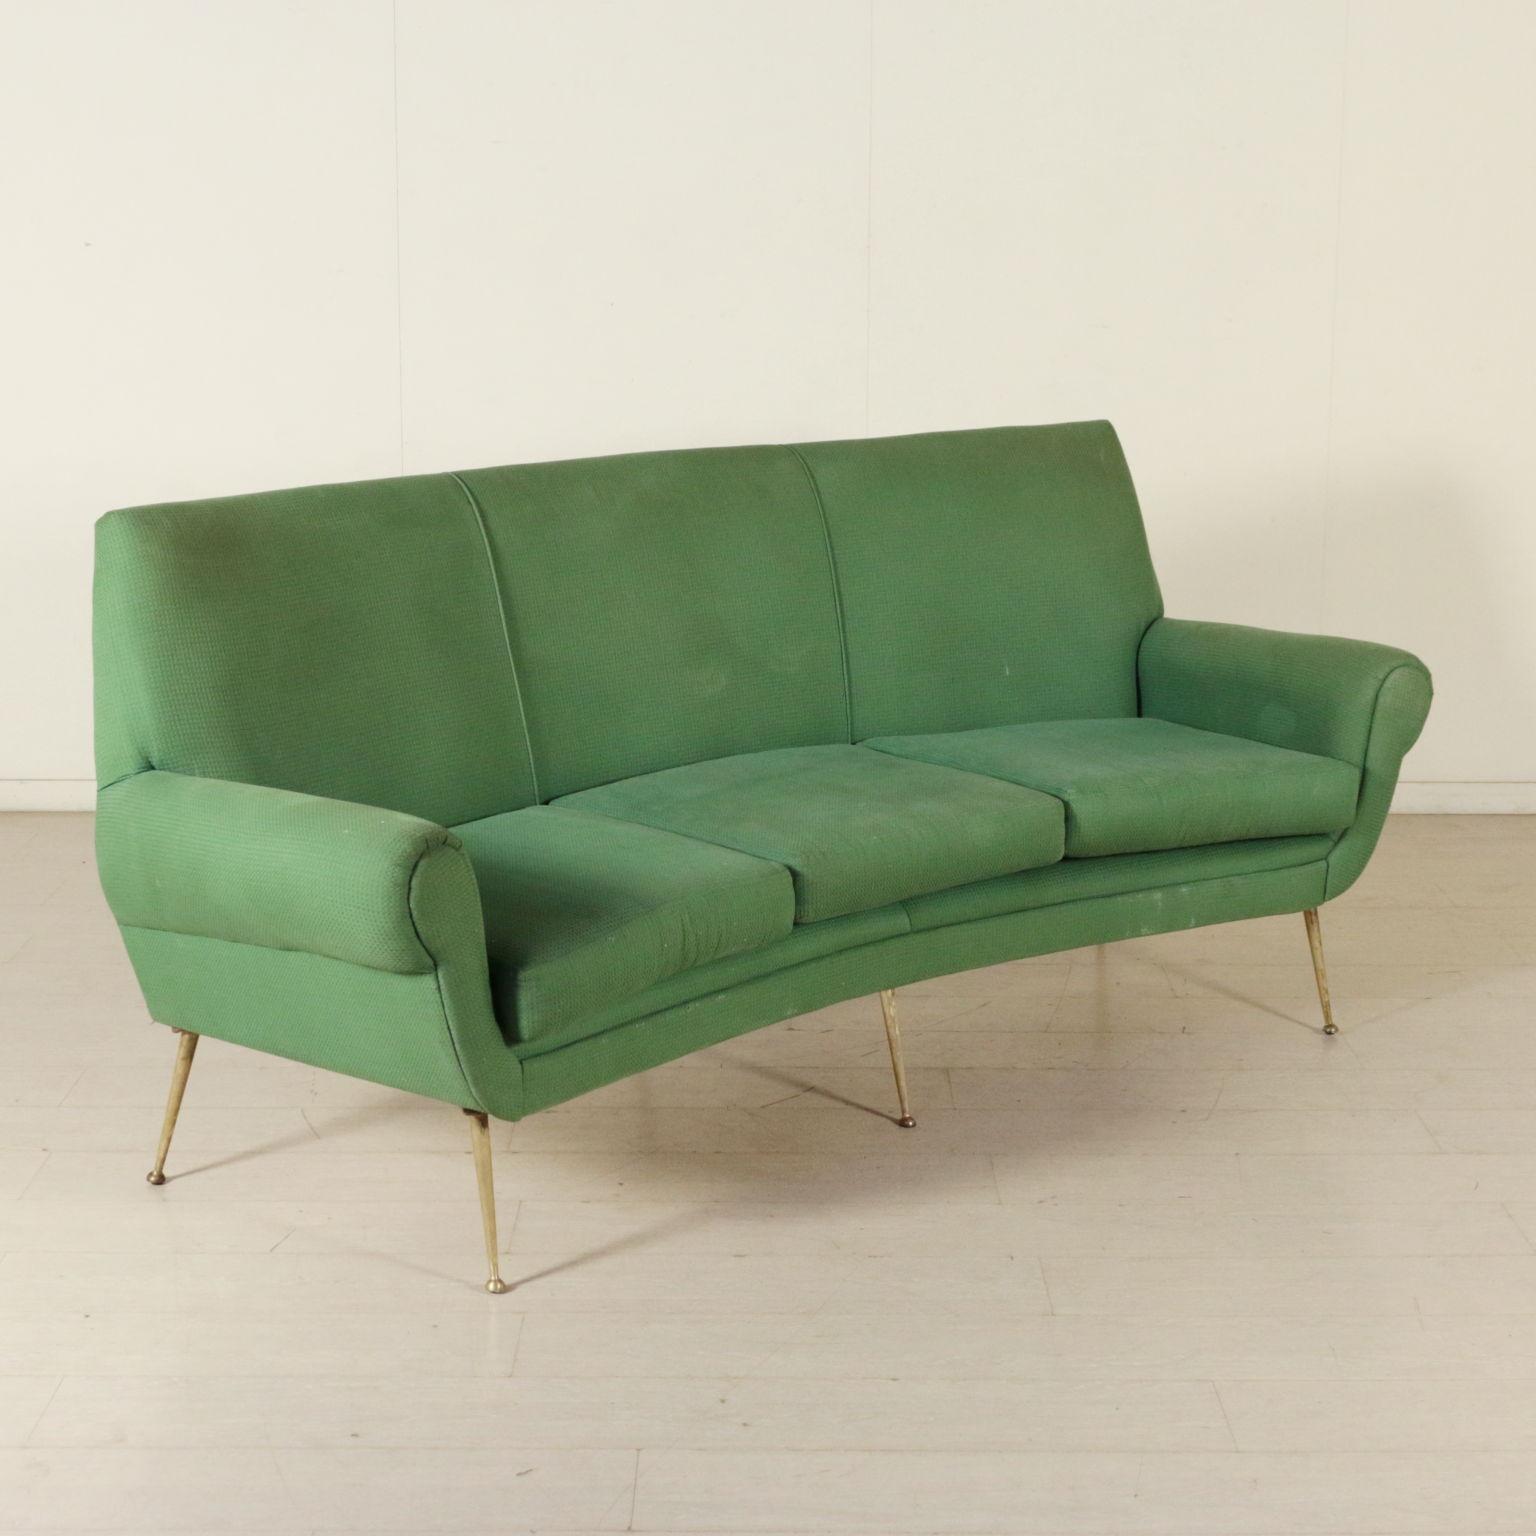 Divani Vintage Anni 60.Sofa Vintage Of The 50s 60s Sofas Modern Design Dimanoinmano It